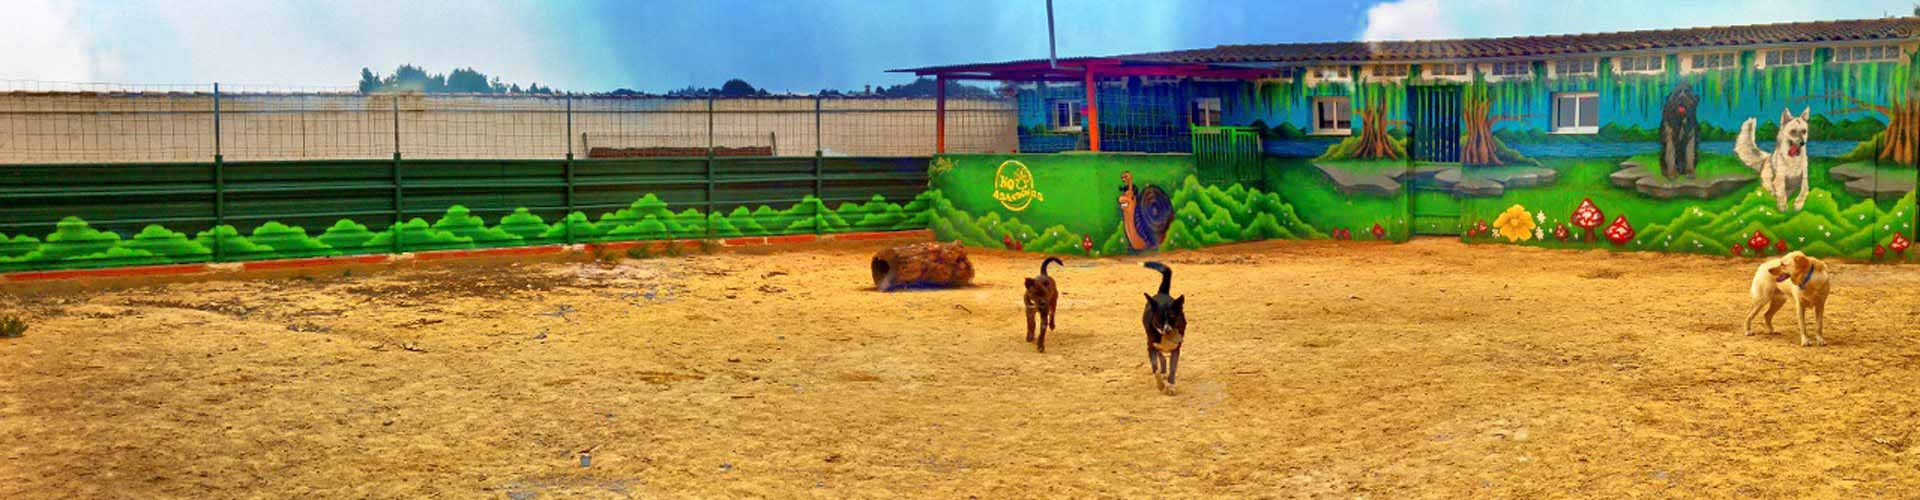 Guardería canina en Murcia